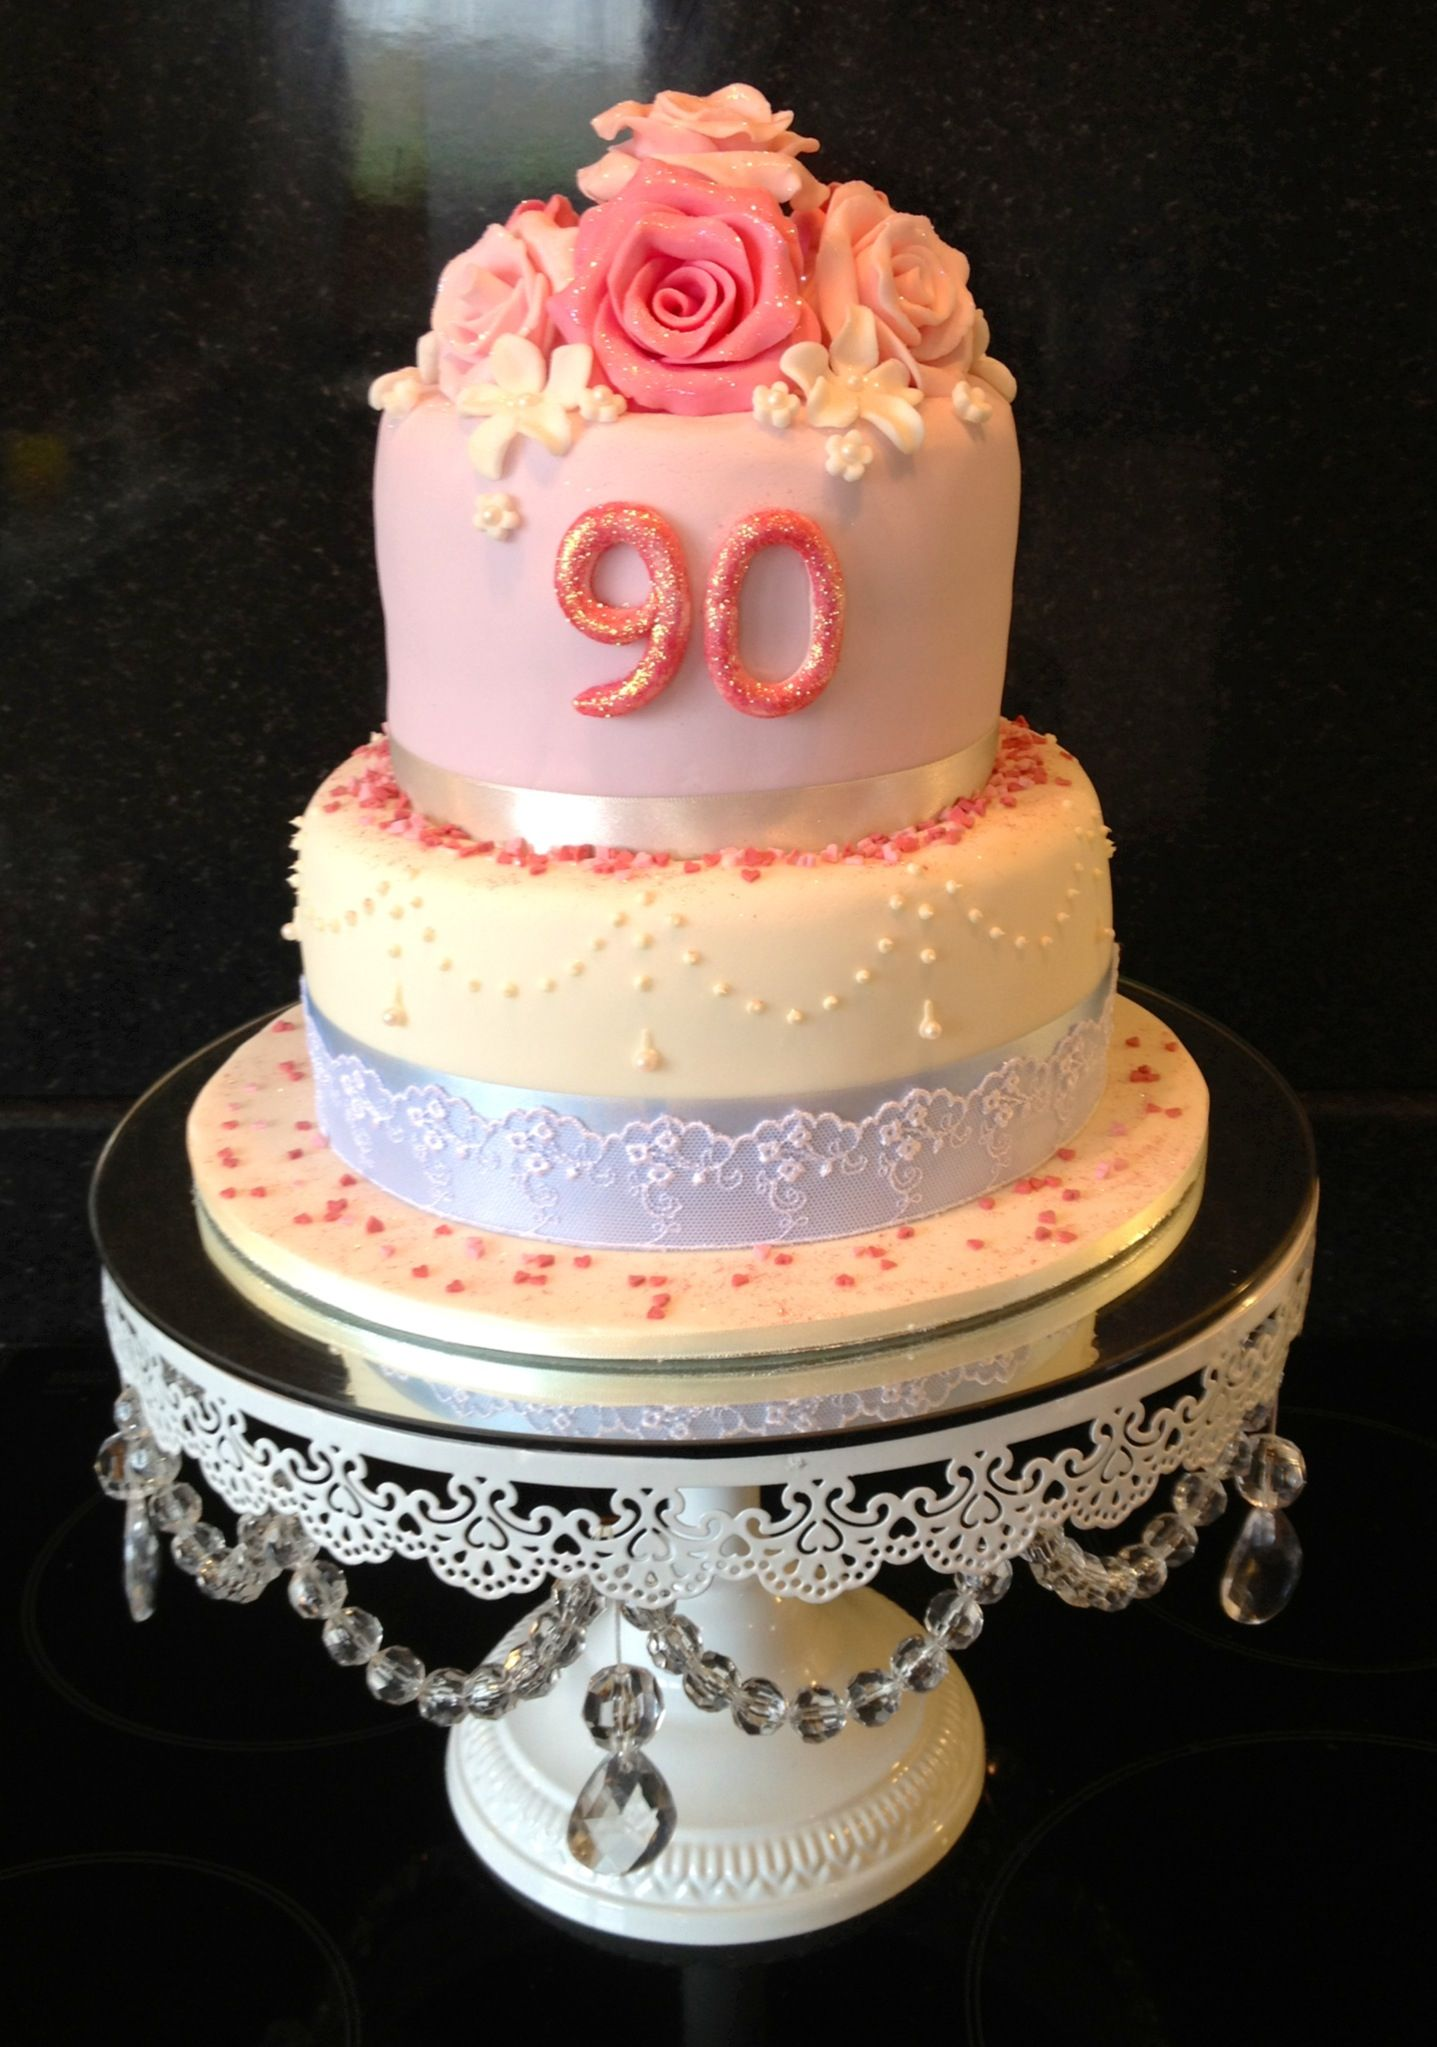 Pleasant 90Th Birthday Cake 90Th Birthday Cakes New Birthday Cake 90Th Funny Birthday Cards Online Elaedamsfinfo